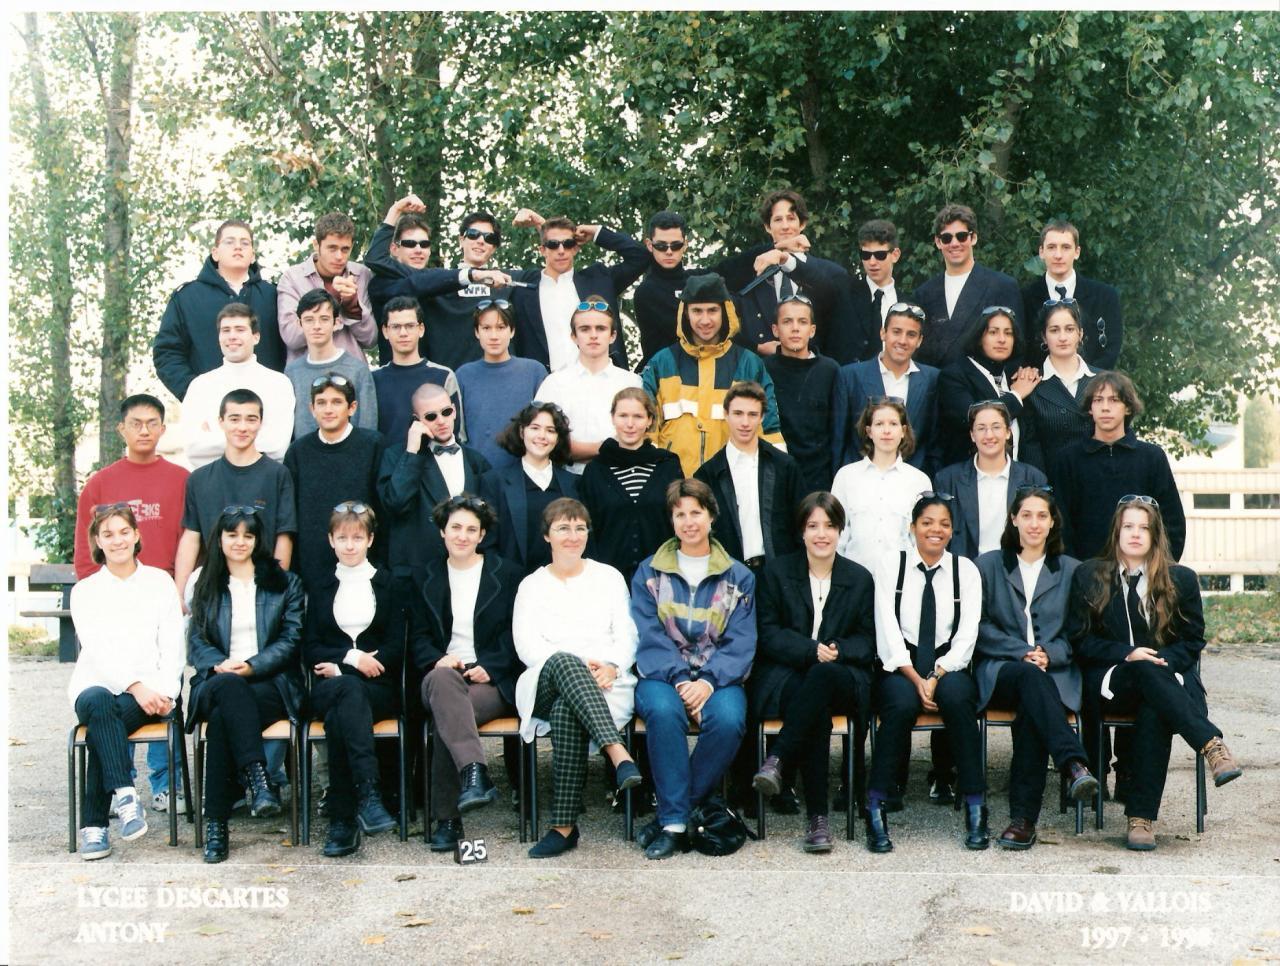 1998 - TS3 - DAVID